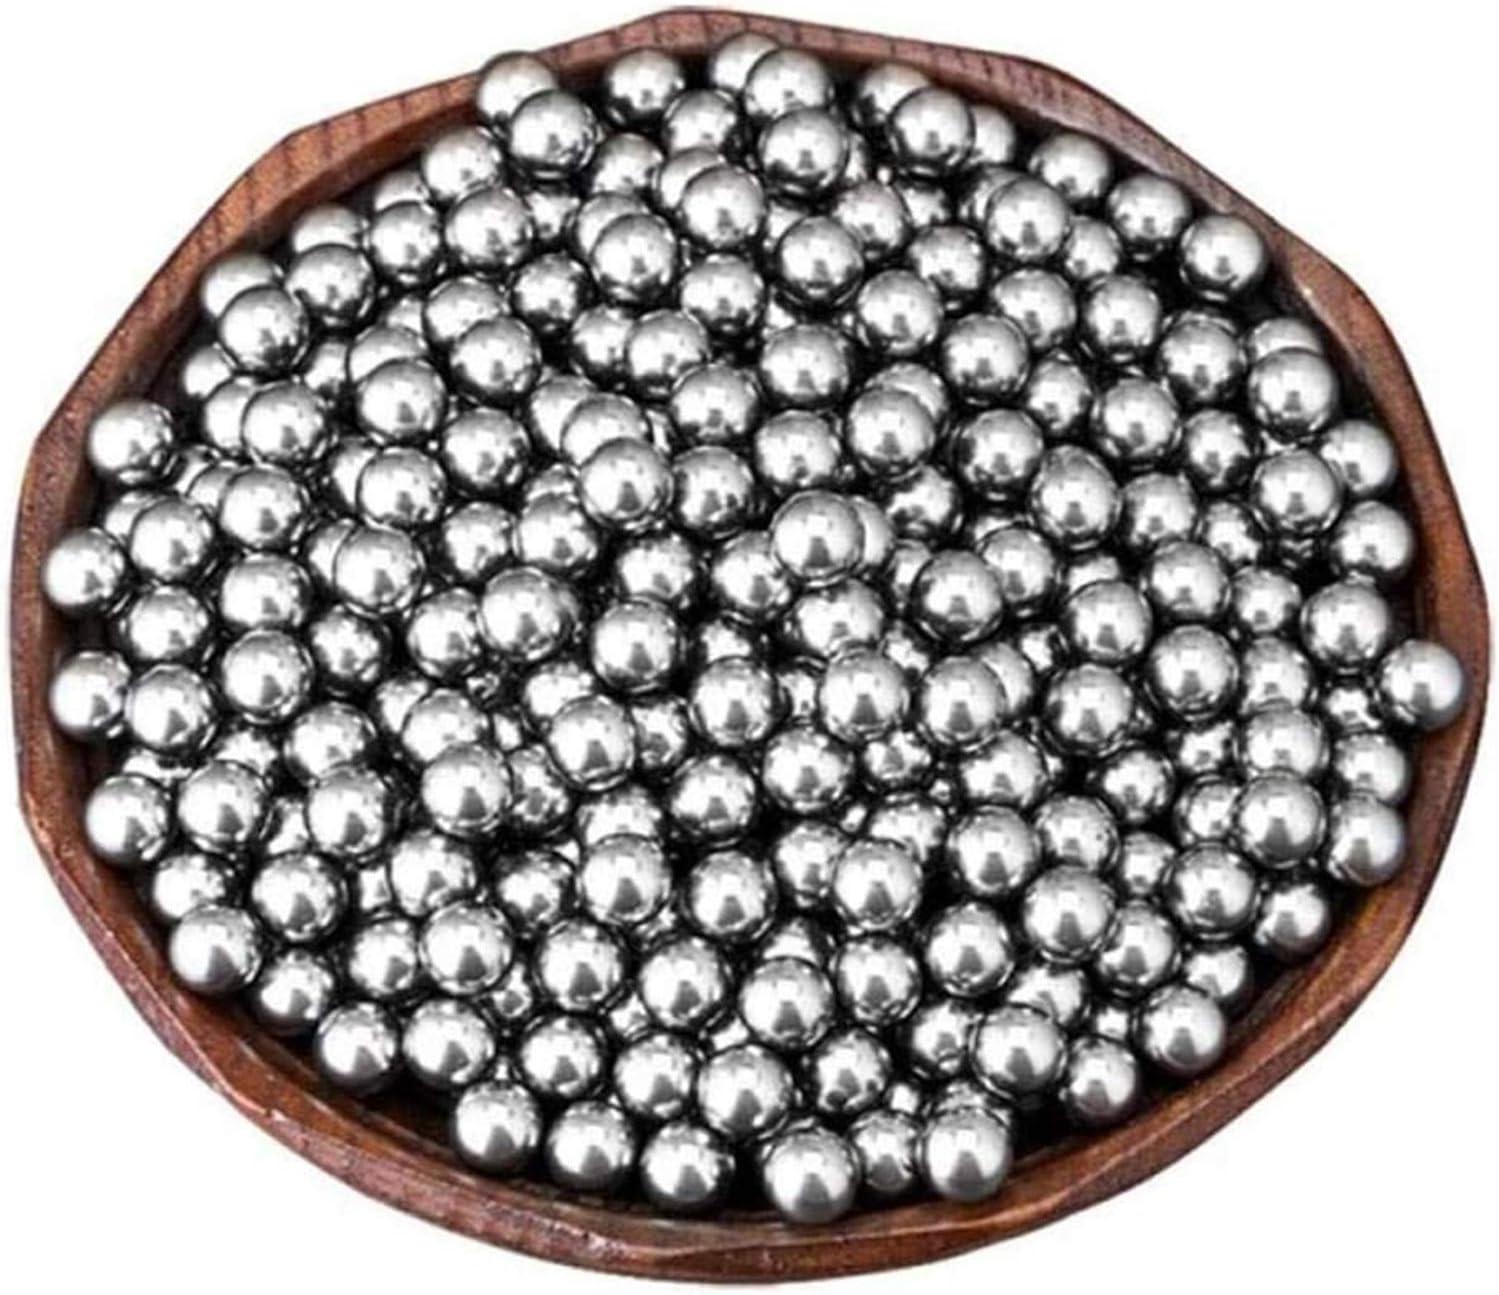 HAOKTSB Bearing Ball Precision Standard 55% OFF Nashville-Davidson Mall Steel